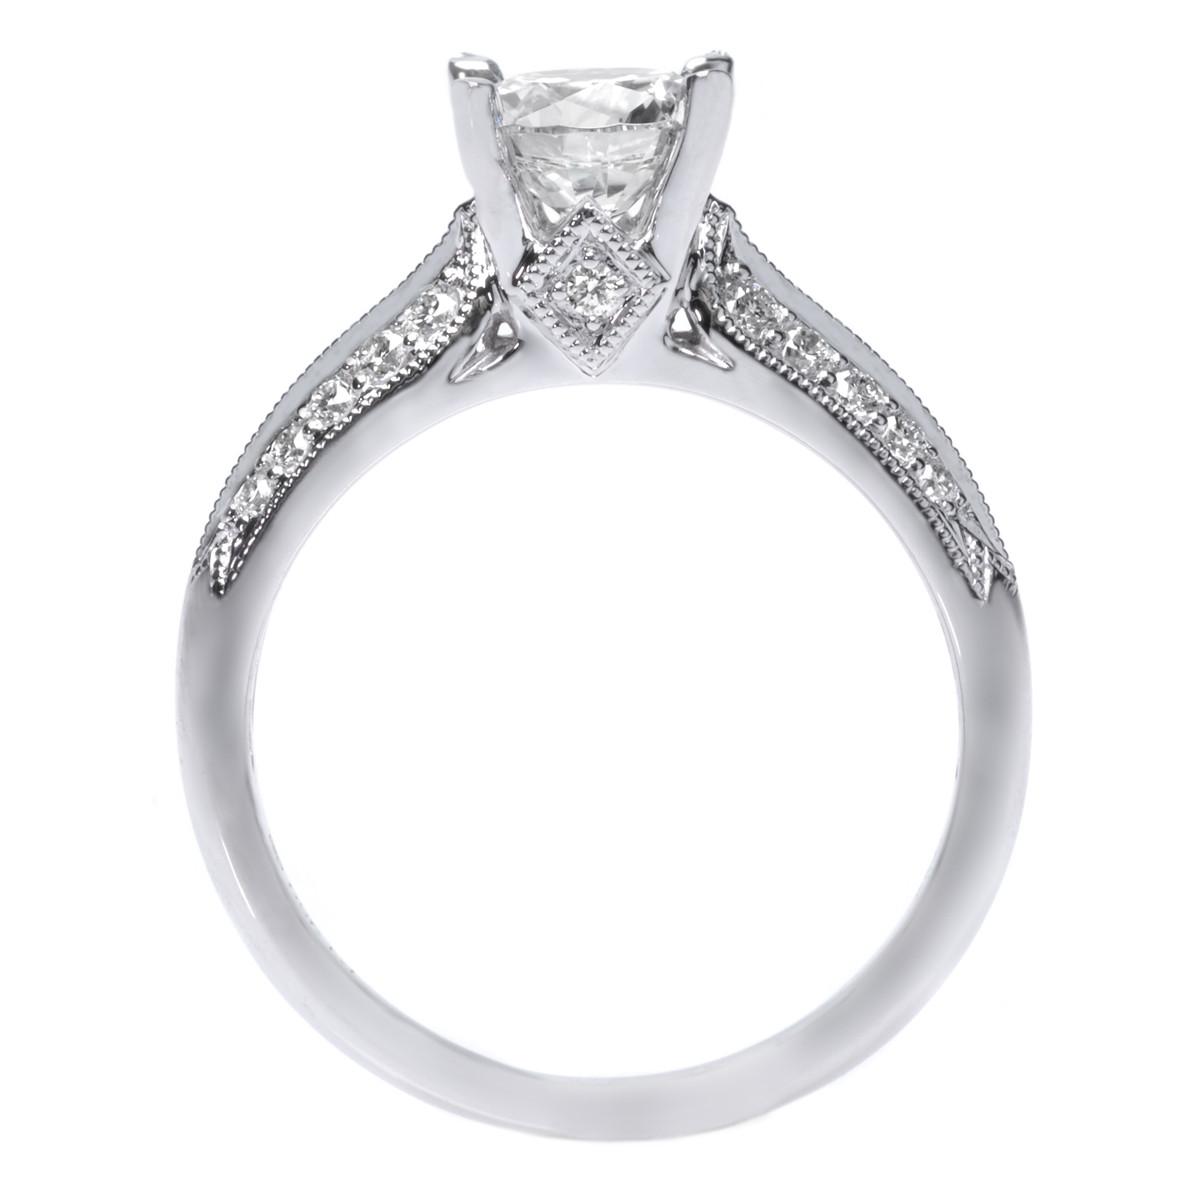 Platinum Knife Edge Pave Diamond Engagement Ring